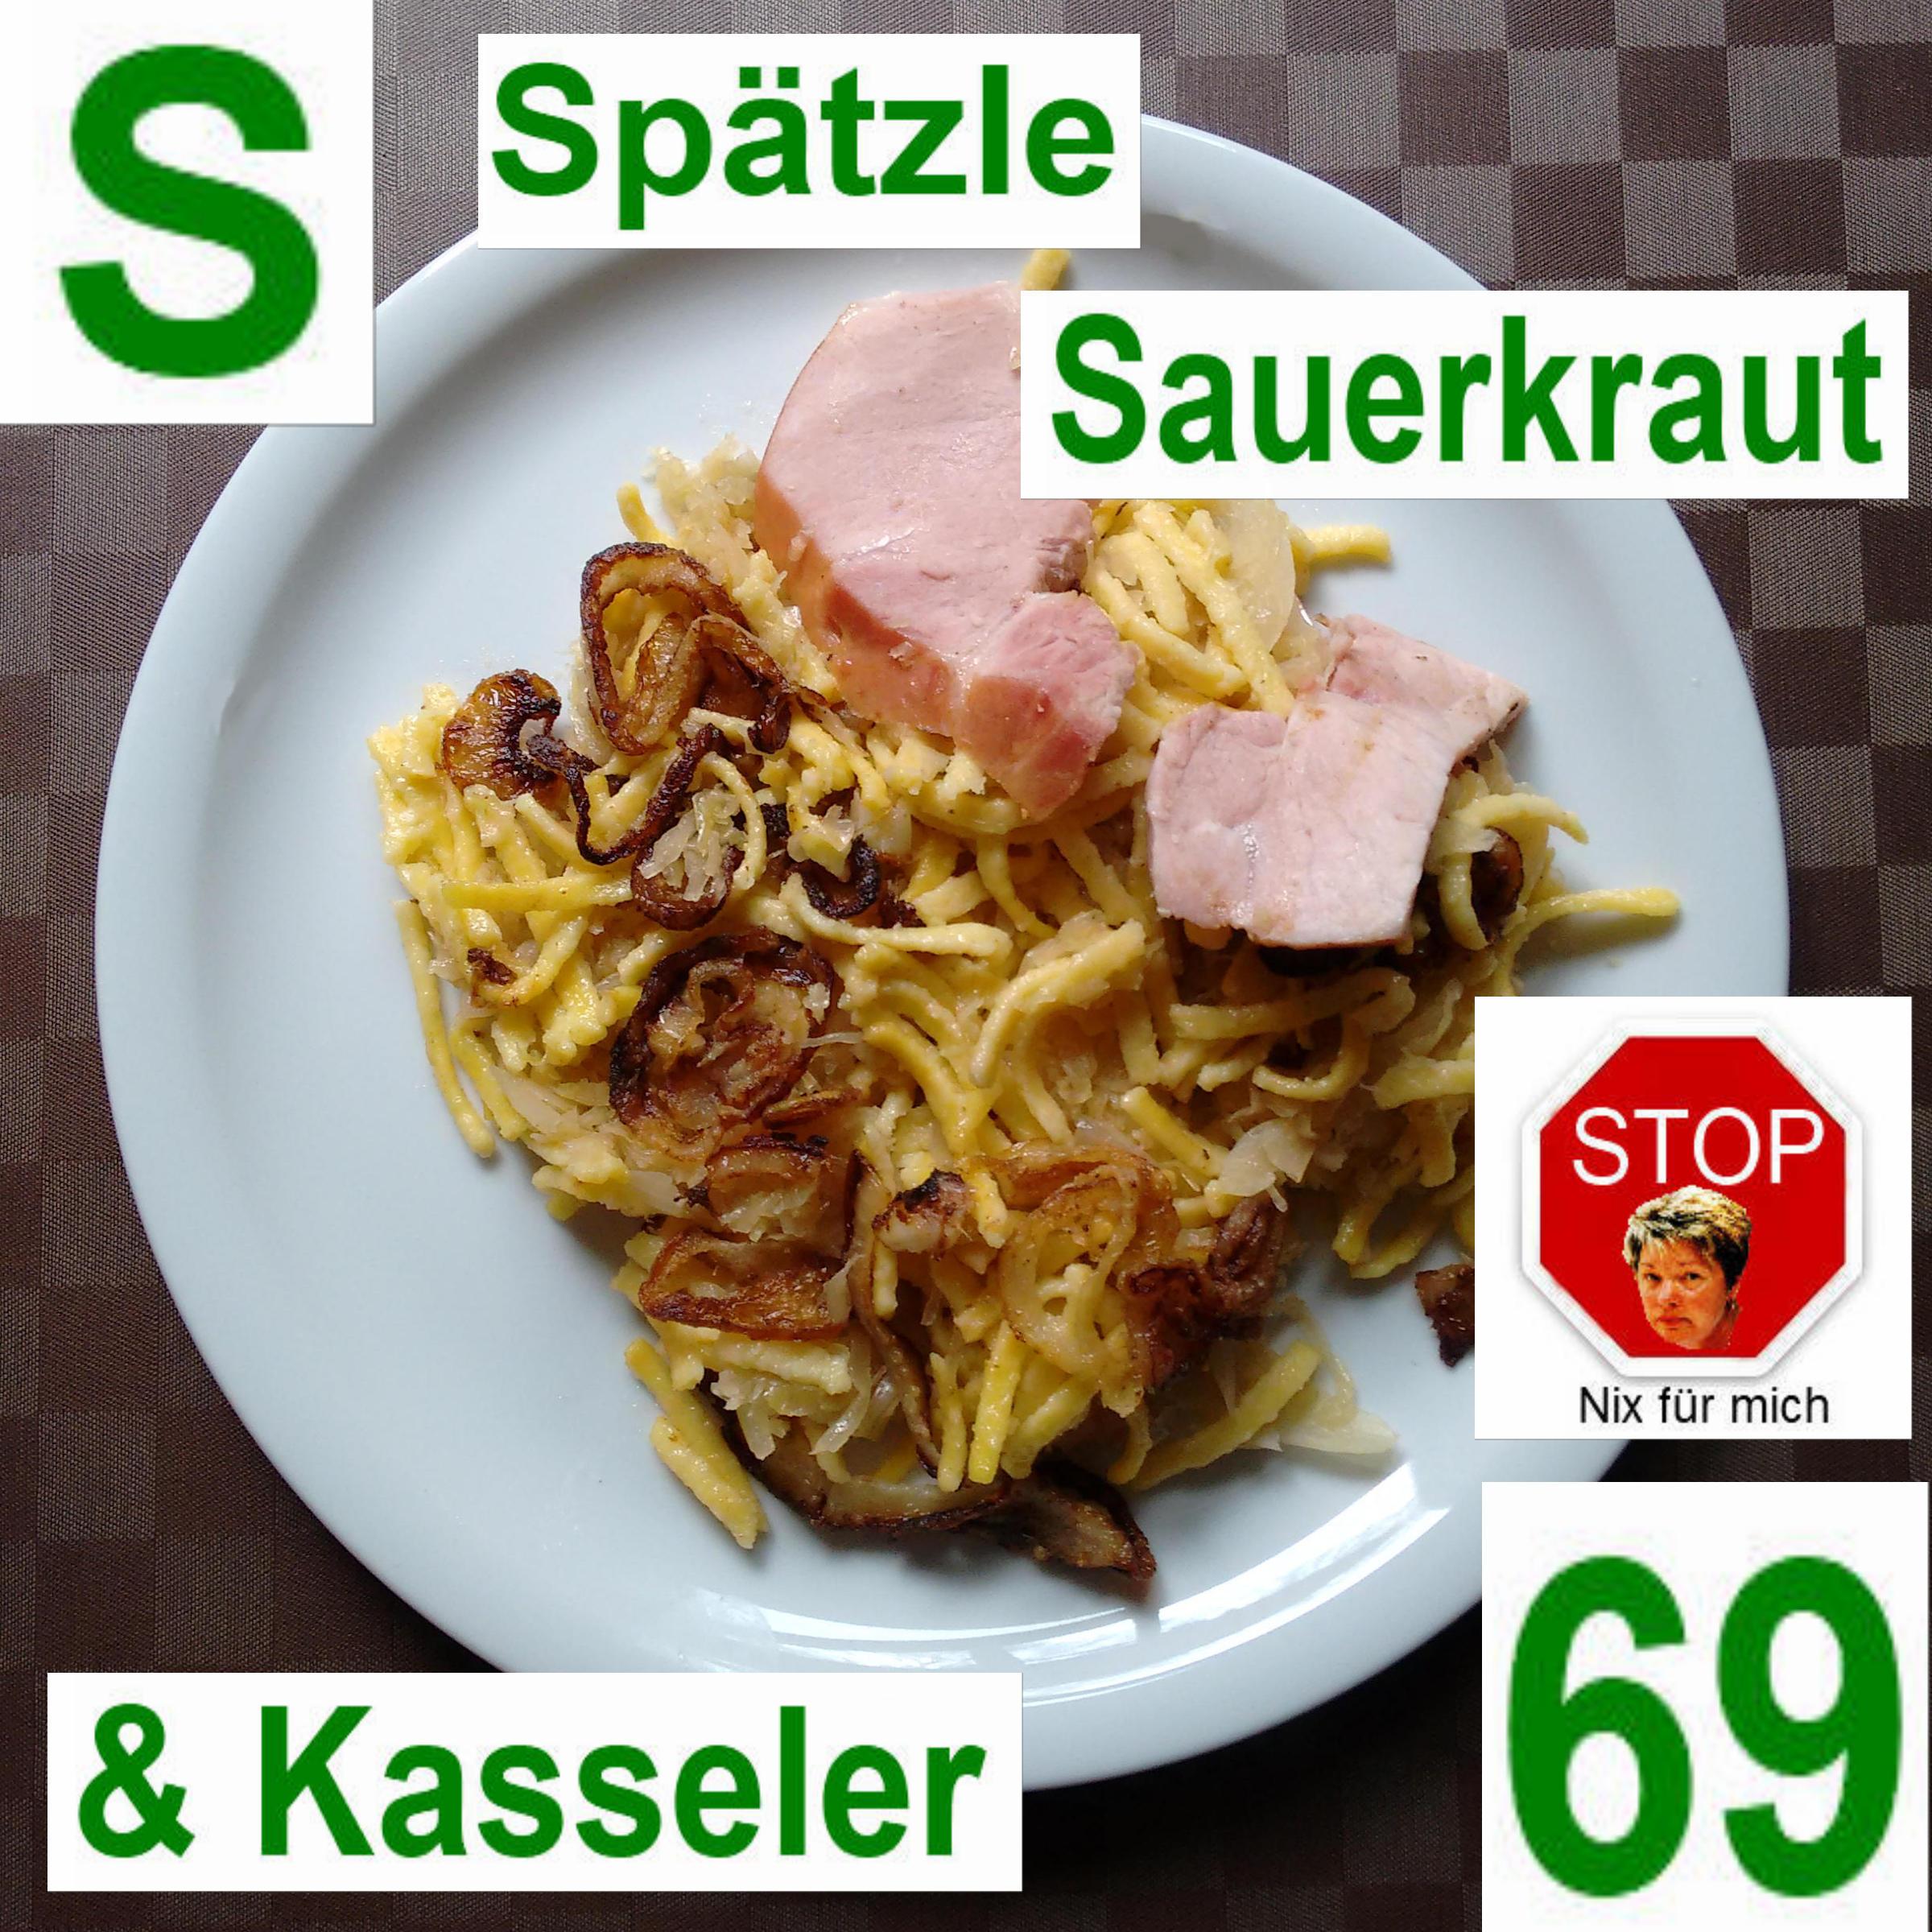 Spätzle Sauerkraut  Kasseler | vonMich